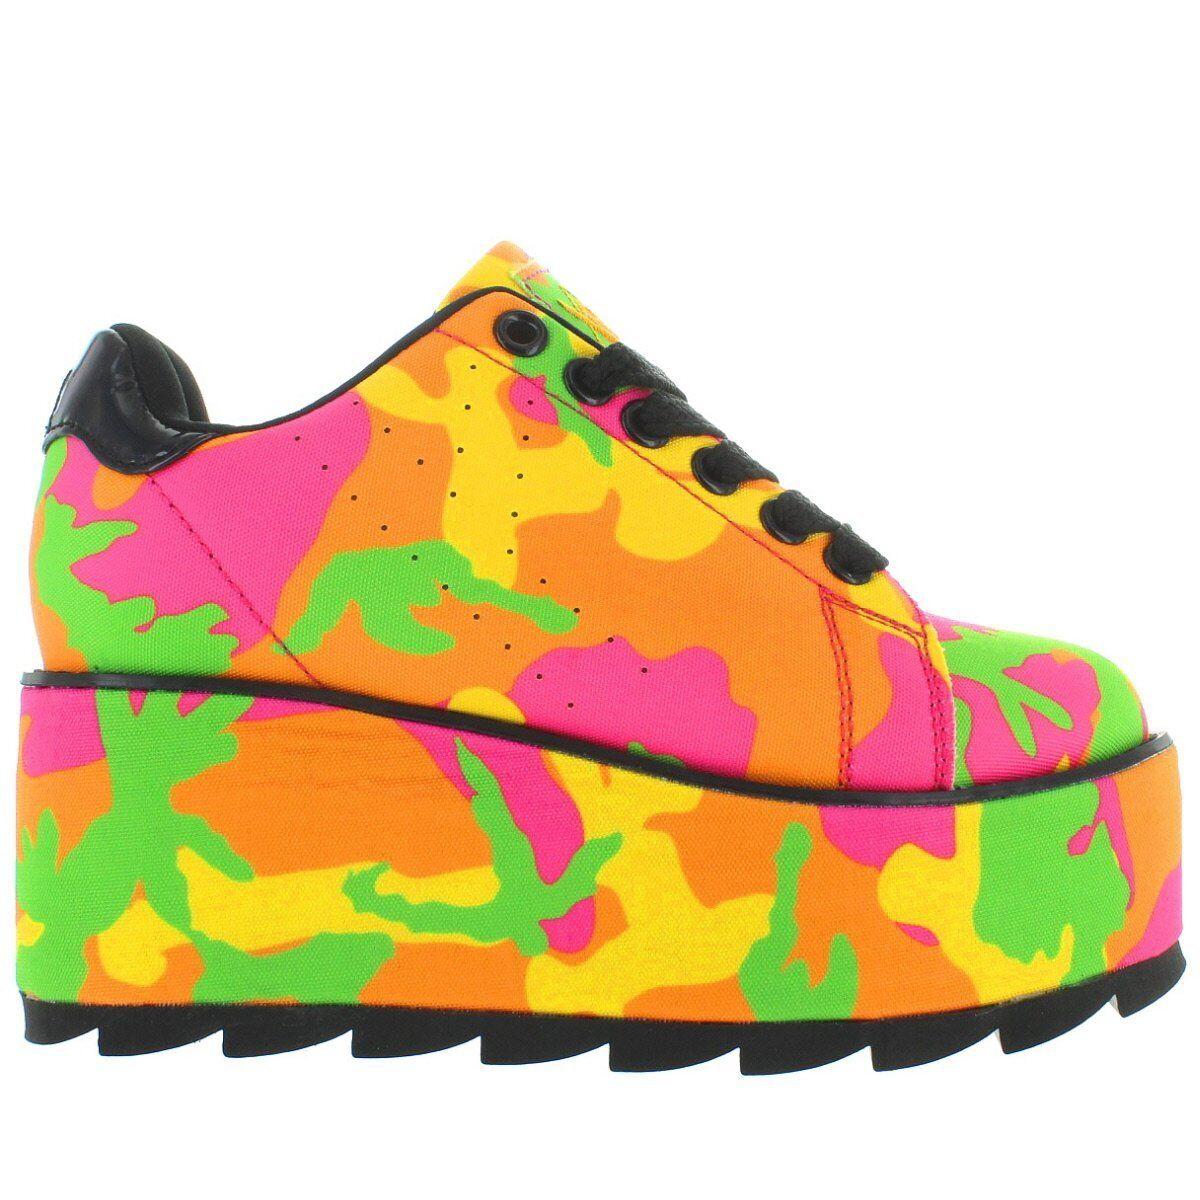 YRU Lala - Neon Camo Mega Platform Wedge Lace Sneaker